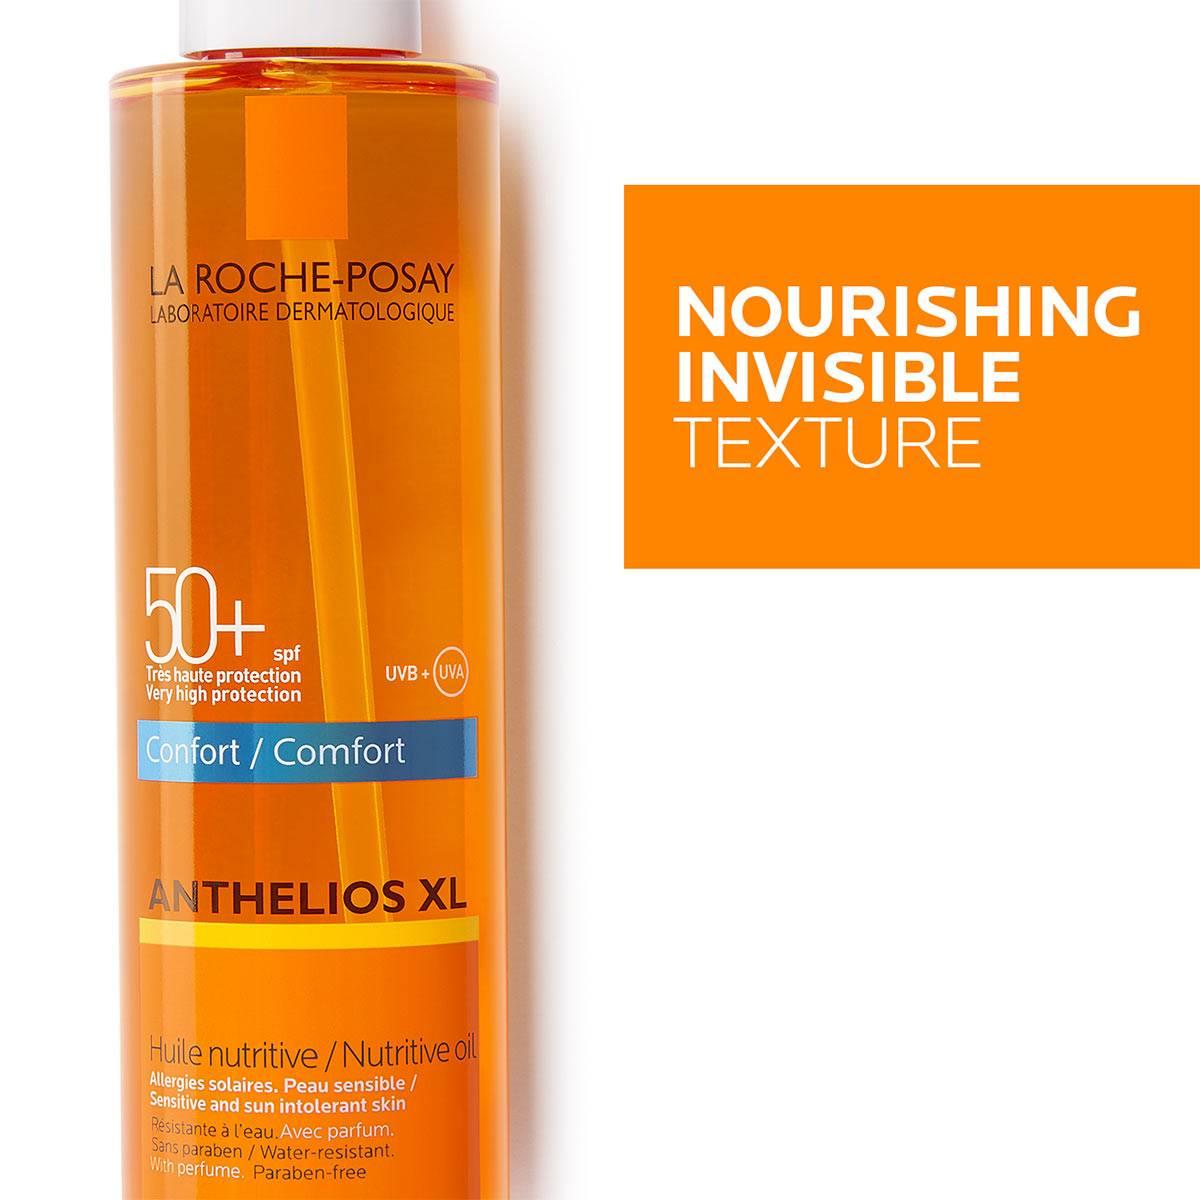 La Roche Posay ProductPage Sun Anthelios XL Nutritive Oil Spf50 200ml